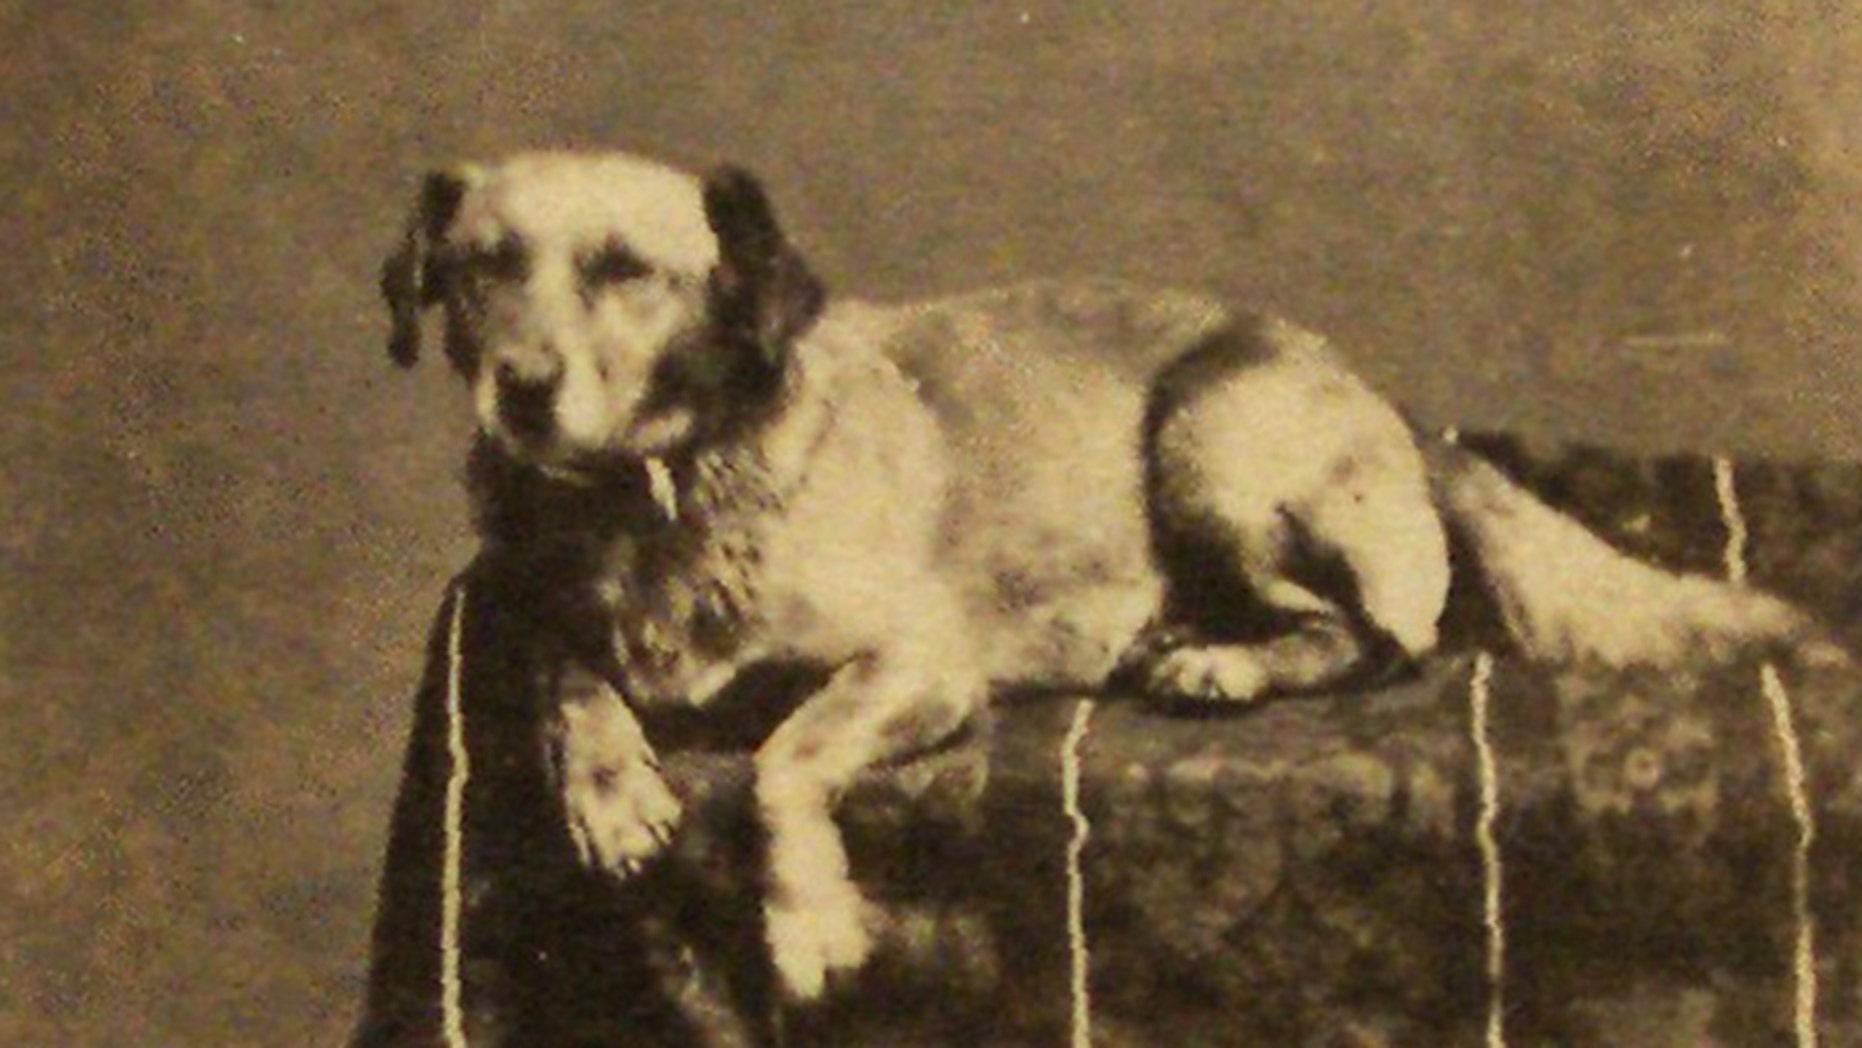 President Abraham Lincolns dog, Fido.